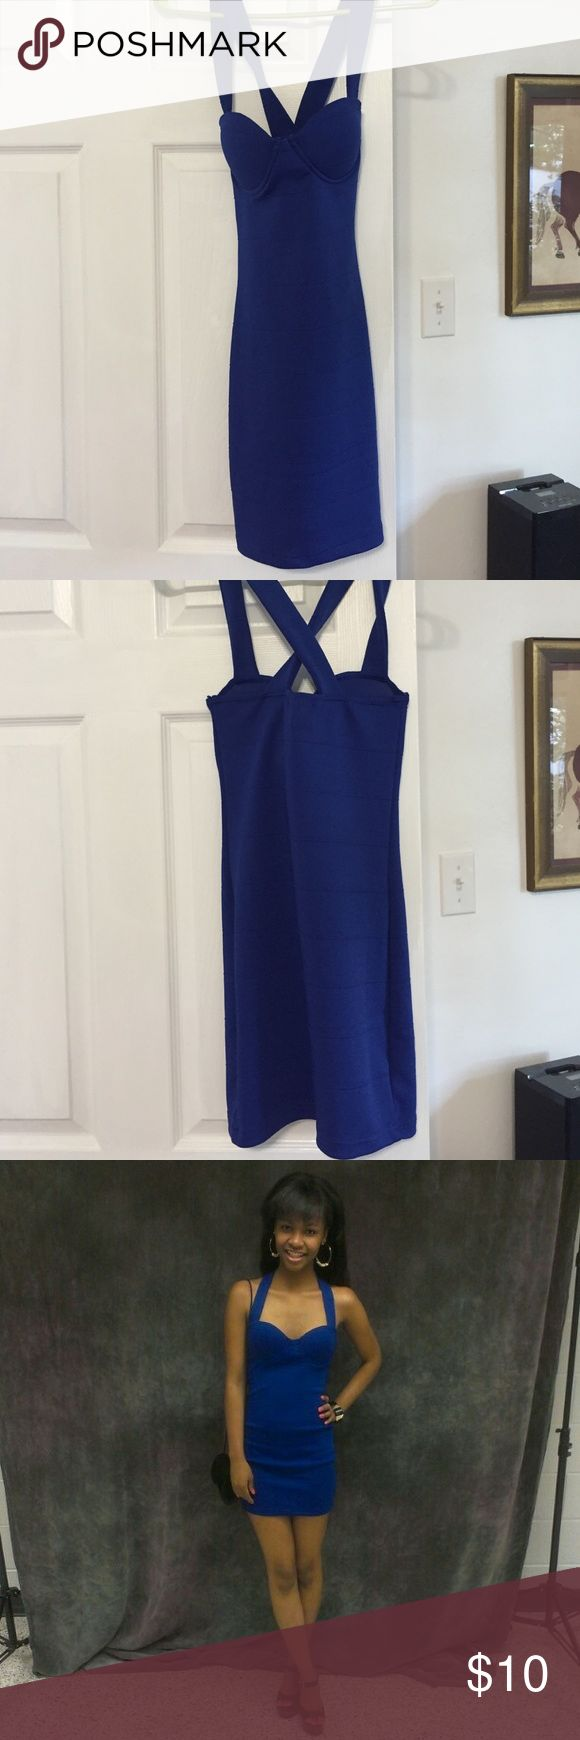 Dark blue, night out dress. Above the knee, dark blue dress for a night out. Cross back. Dresses Mini